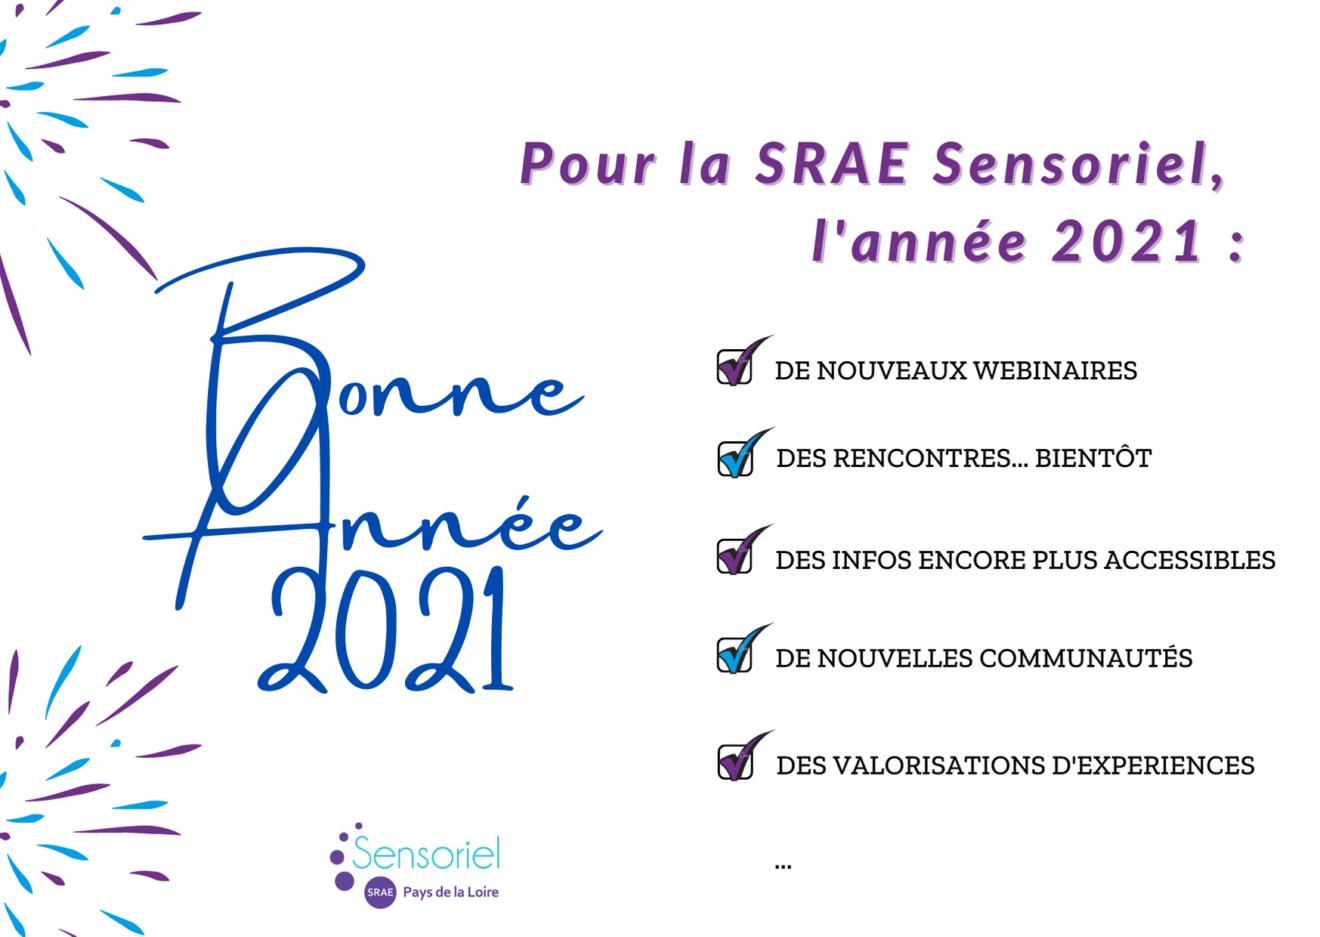 Voeux 2021 SRAE Sensoriel